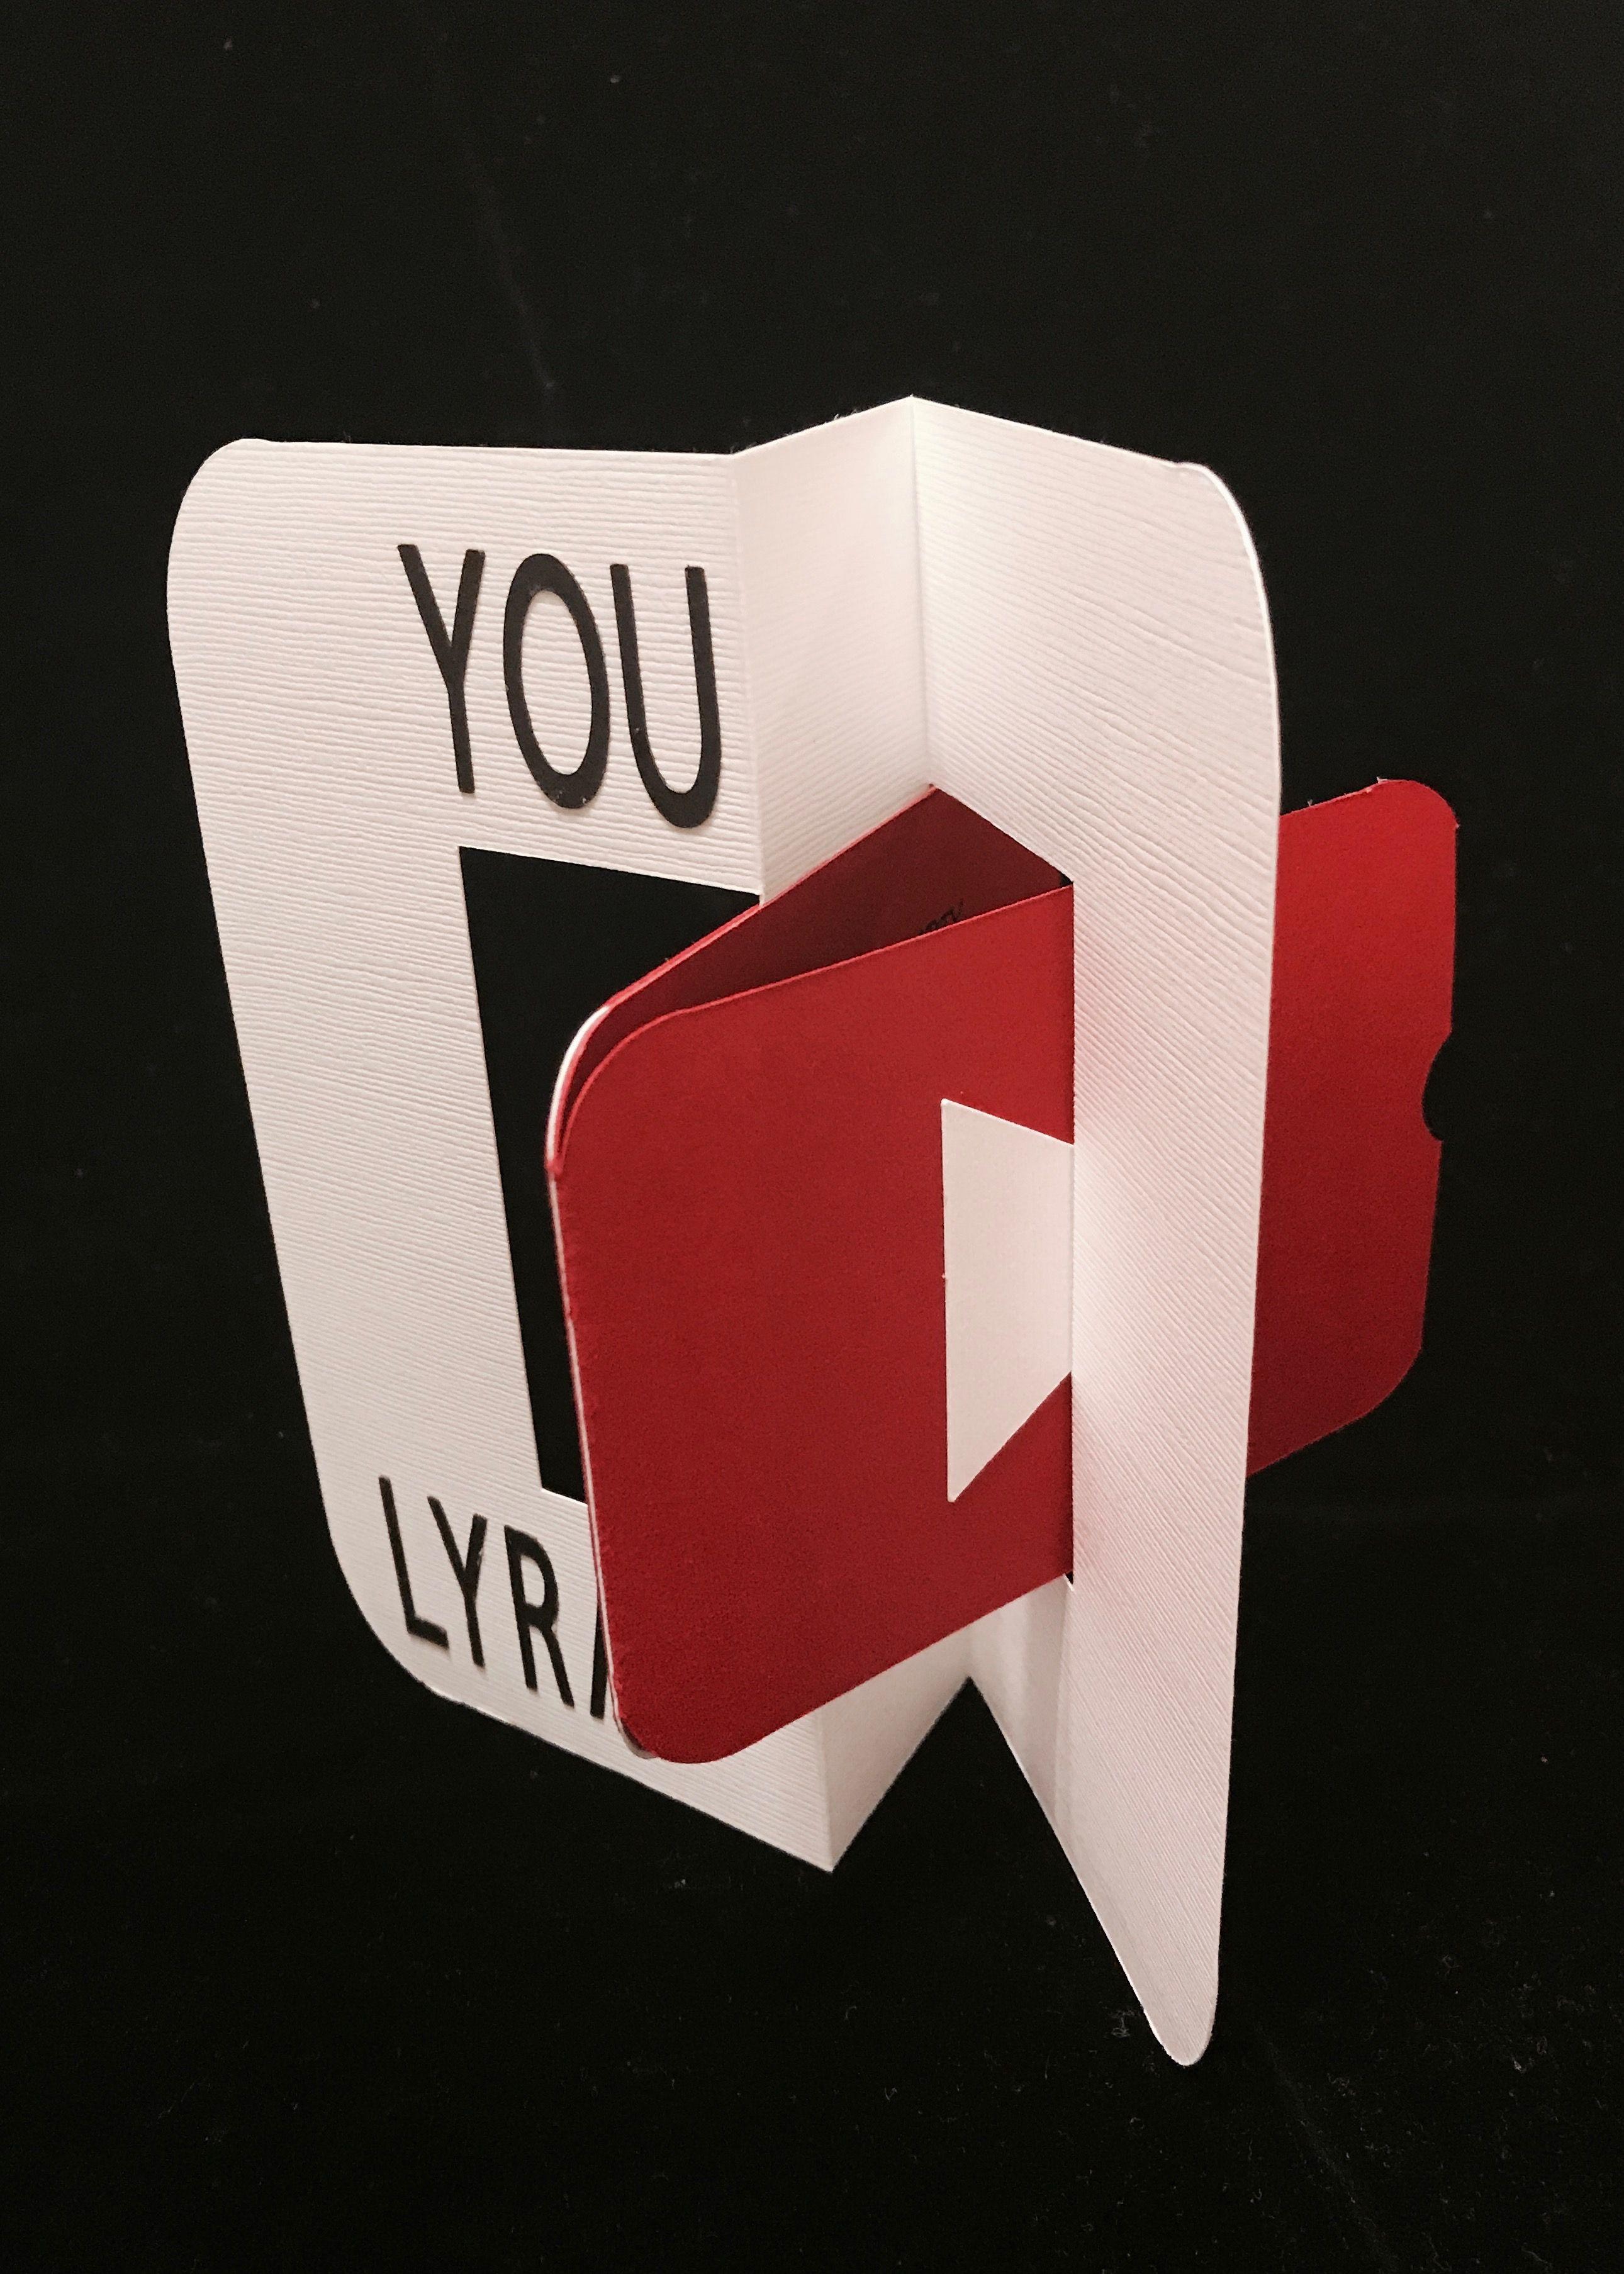 YOUTUBE INVITATION CARD  Cards, Cards handmade, Invitation cards